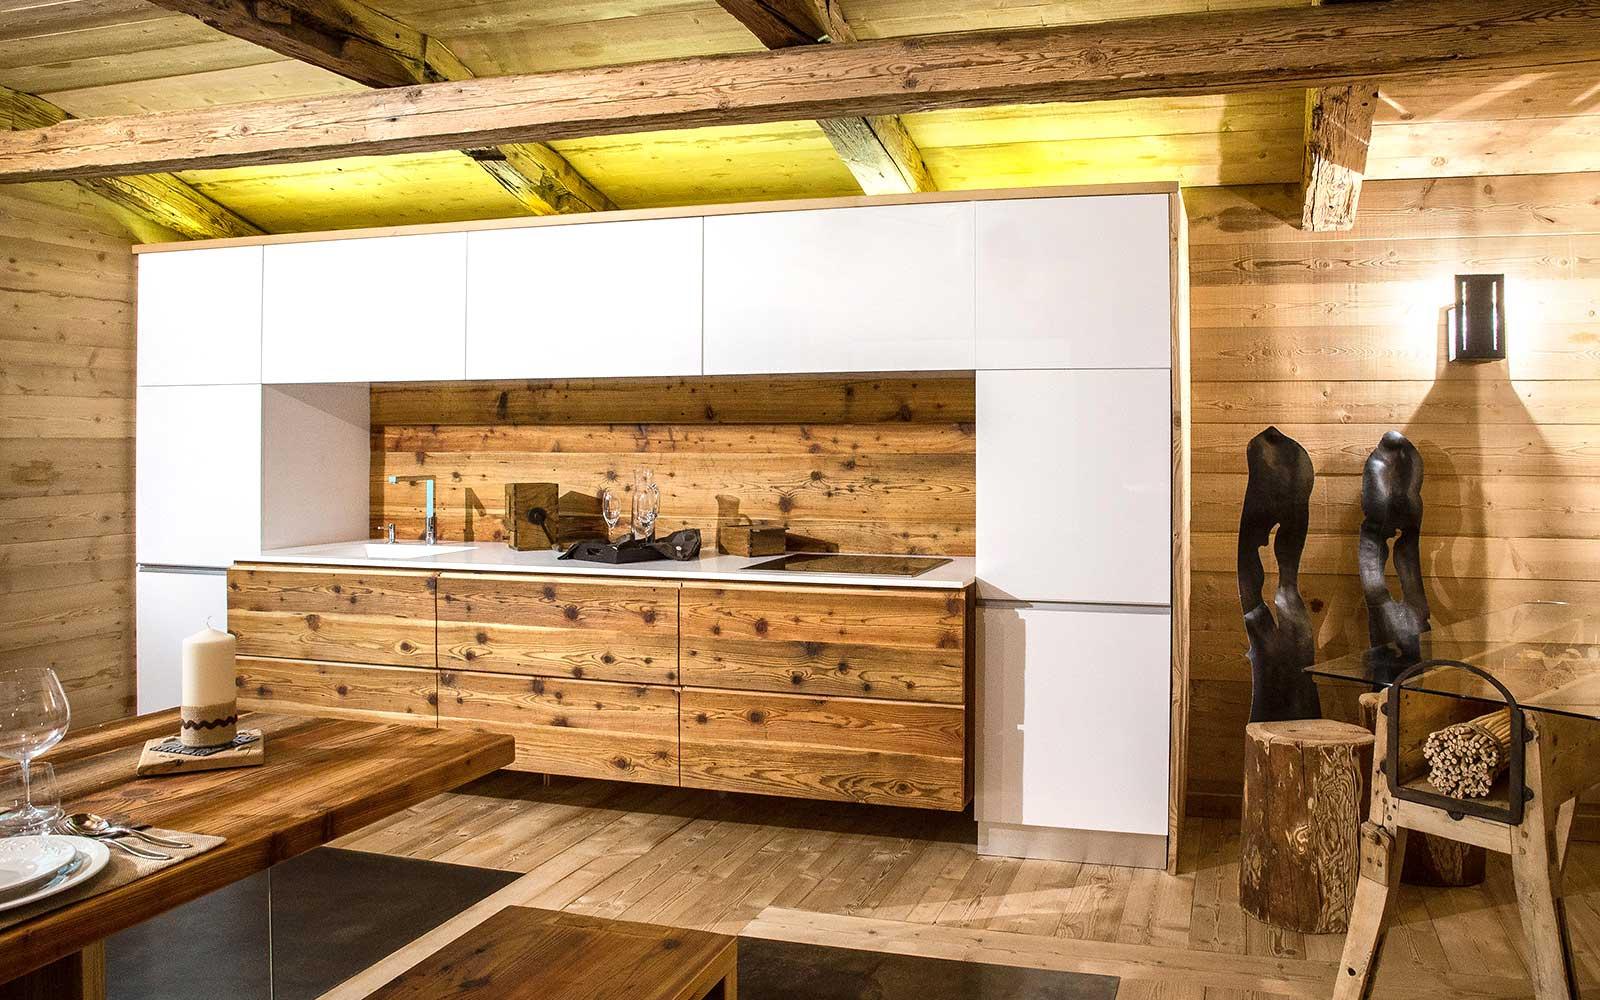 Arredamento Rustico Casa falegnameria hermann - falegnameria artigiana recupero